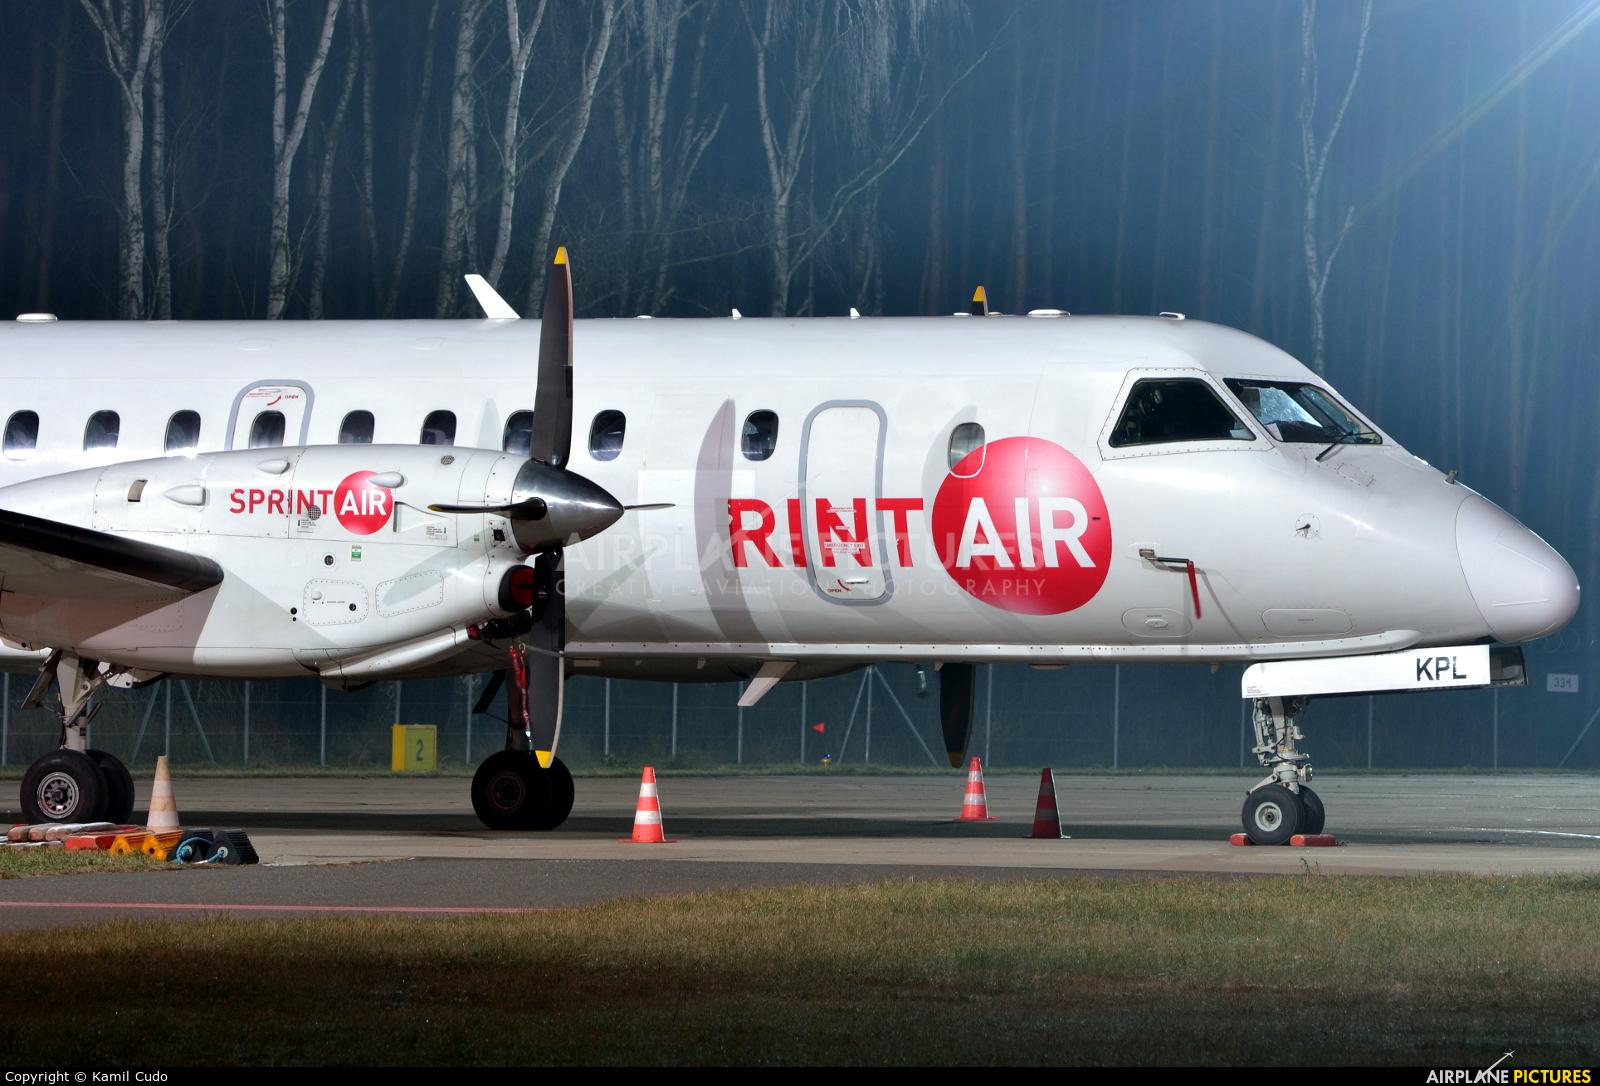 Sprint Air SP-KPL aircraft at Babimost